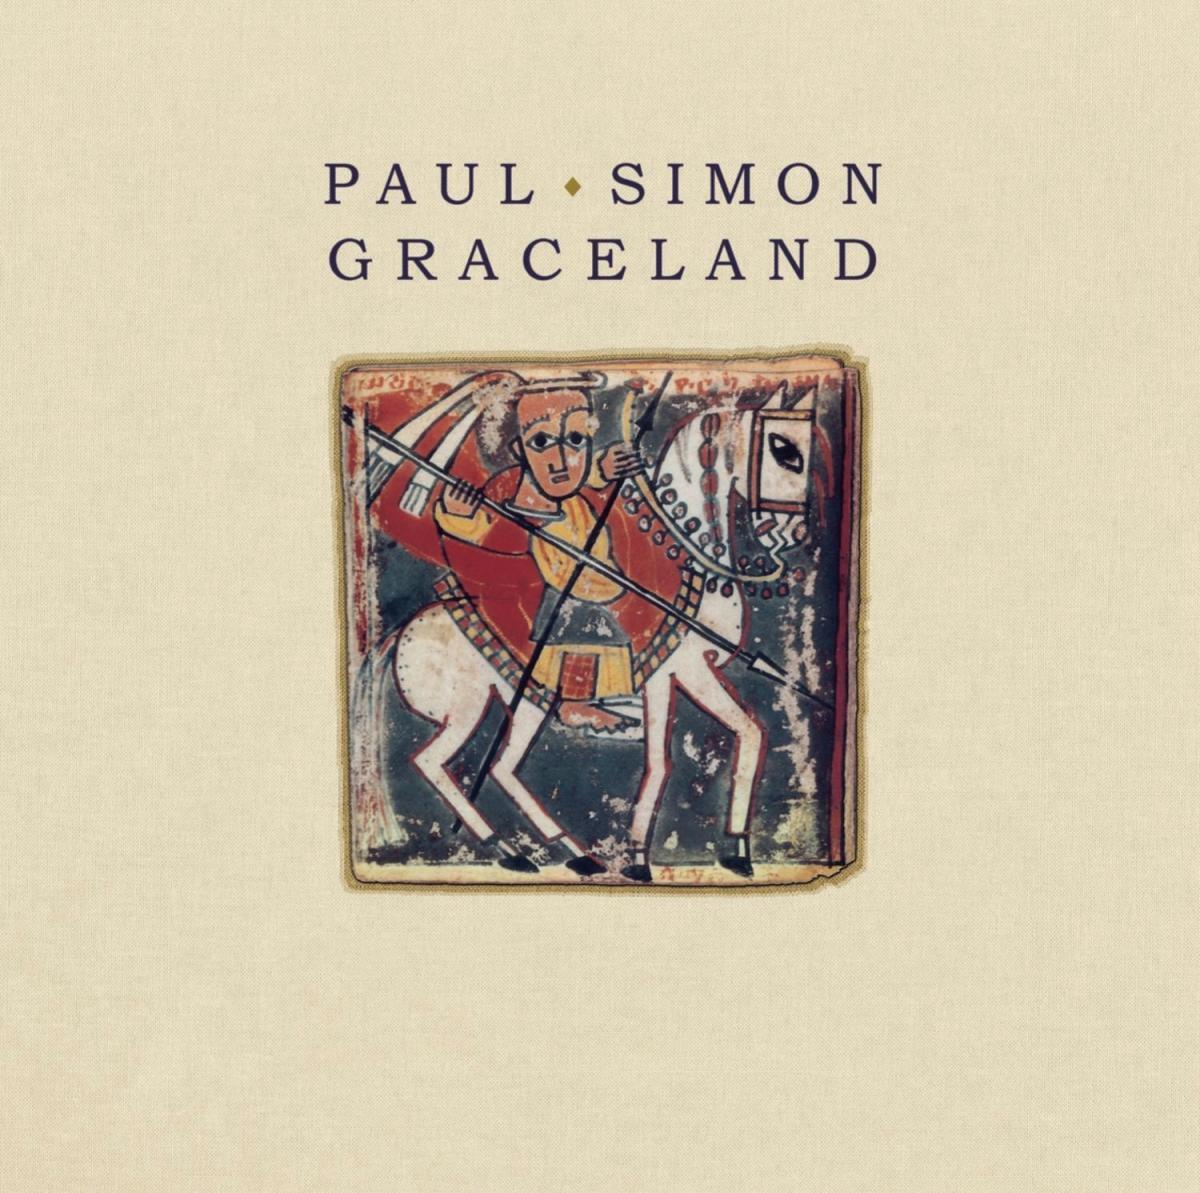 Graceland (25th Anniversary Edition) - Paul Simon